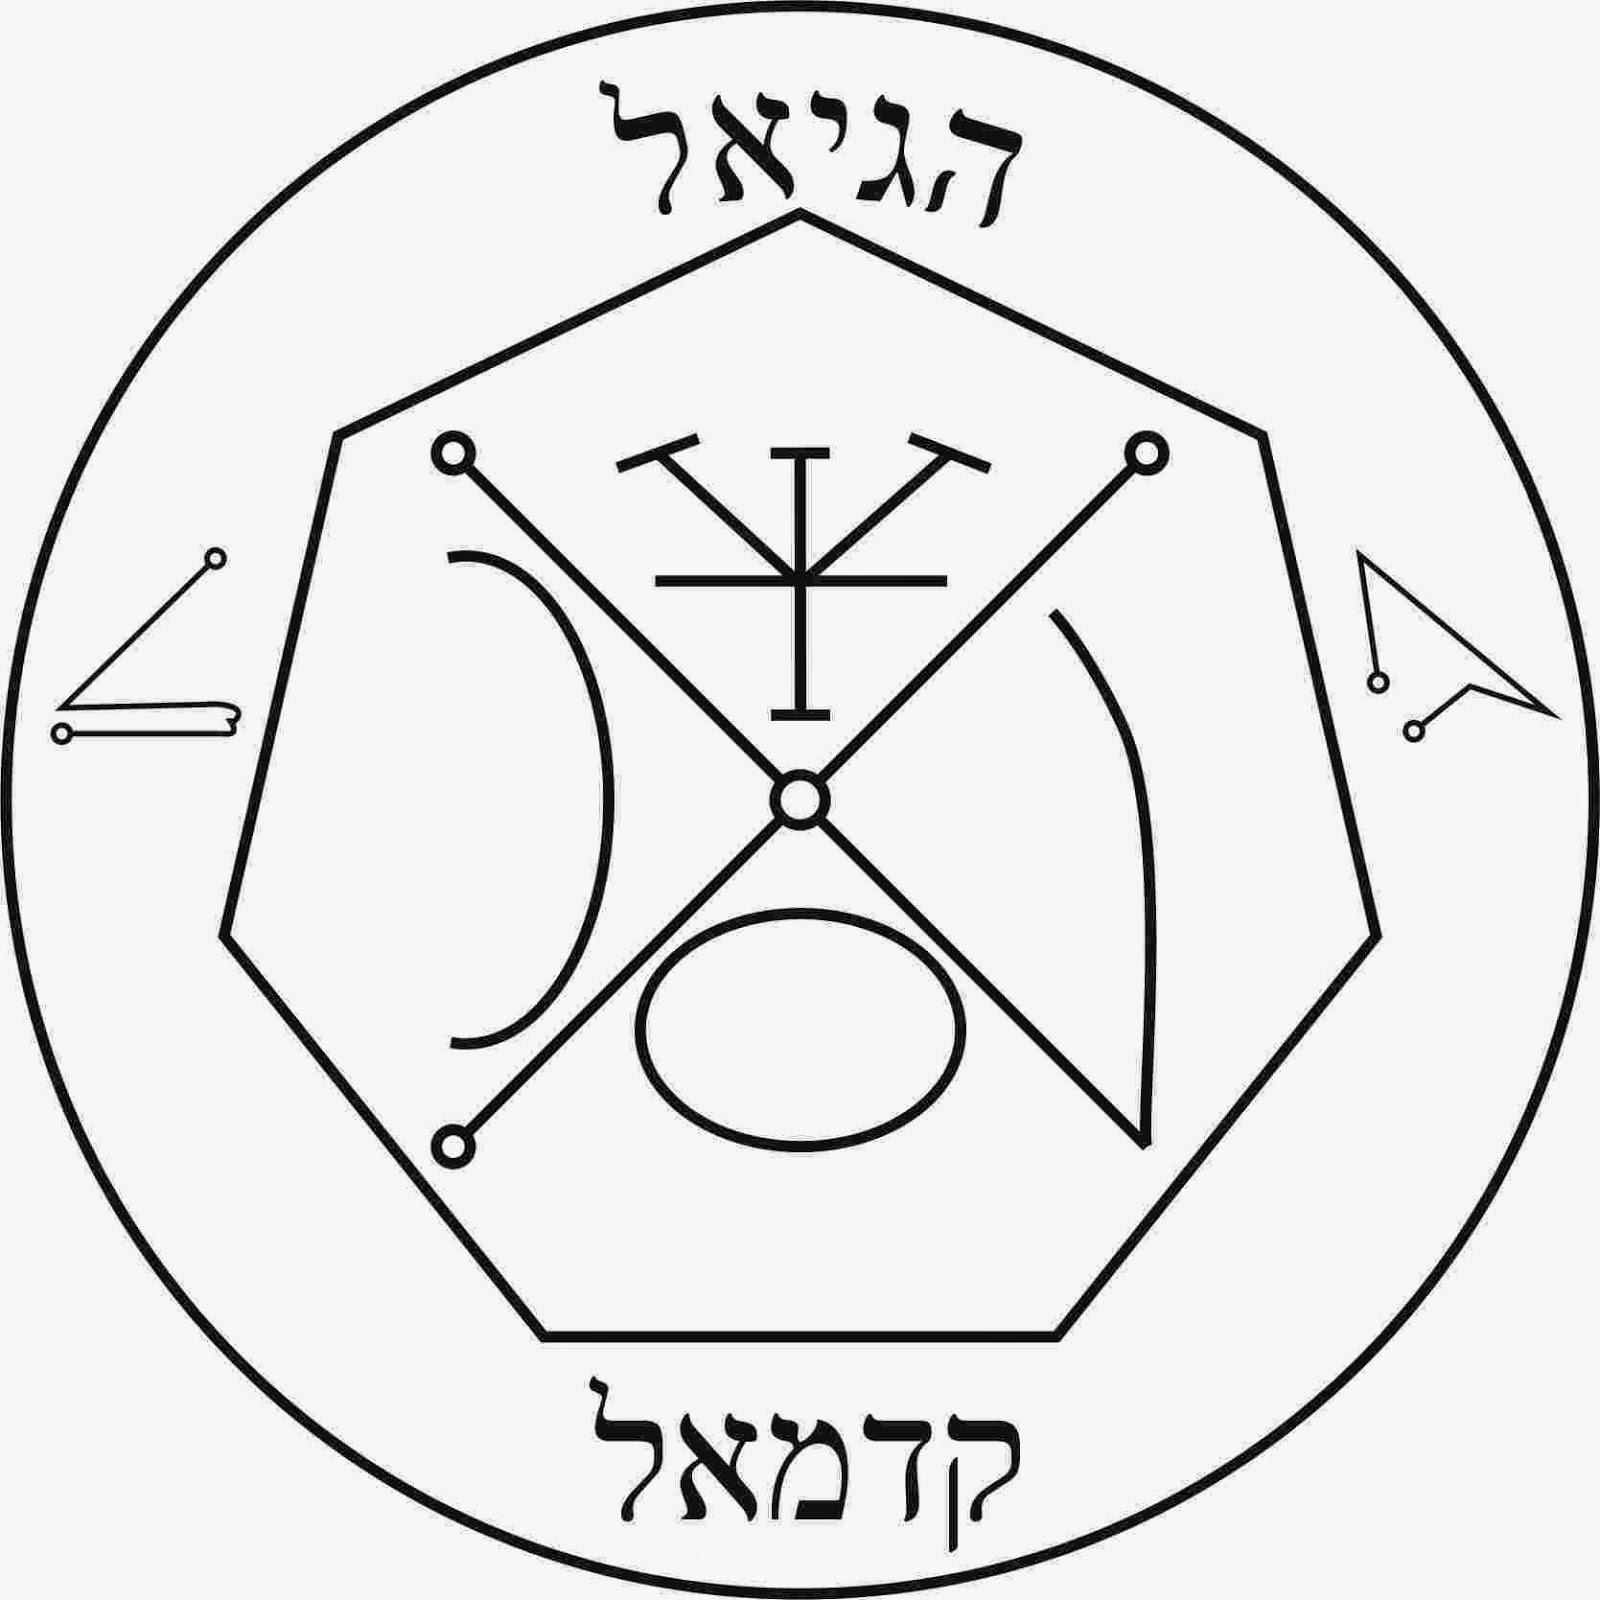 Key To The Key Of Solomon Love Magic How To Improve Venus Talisman